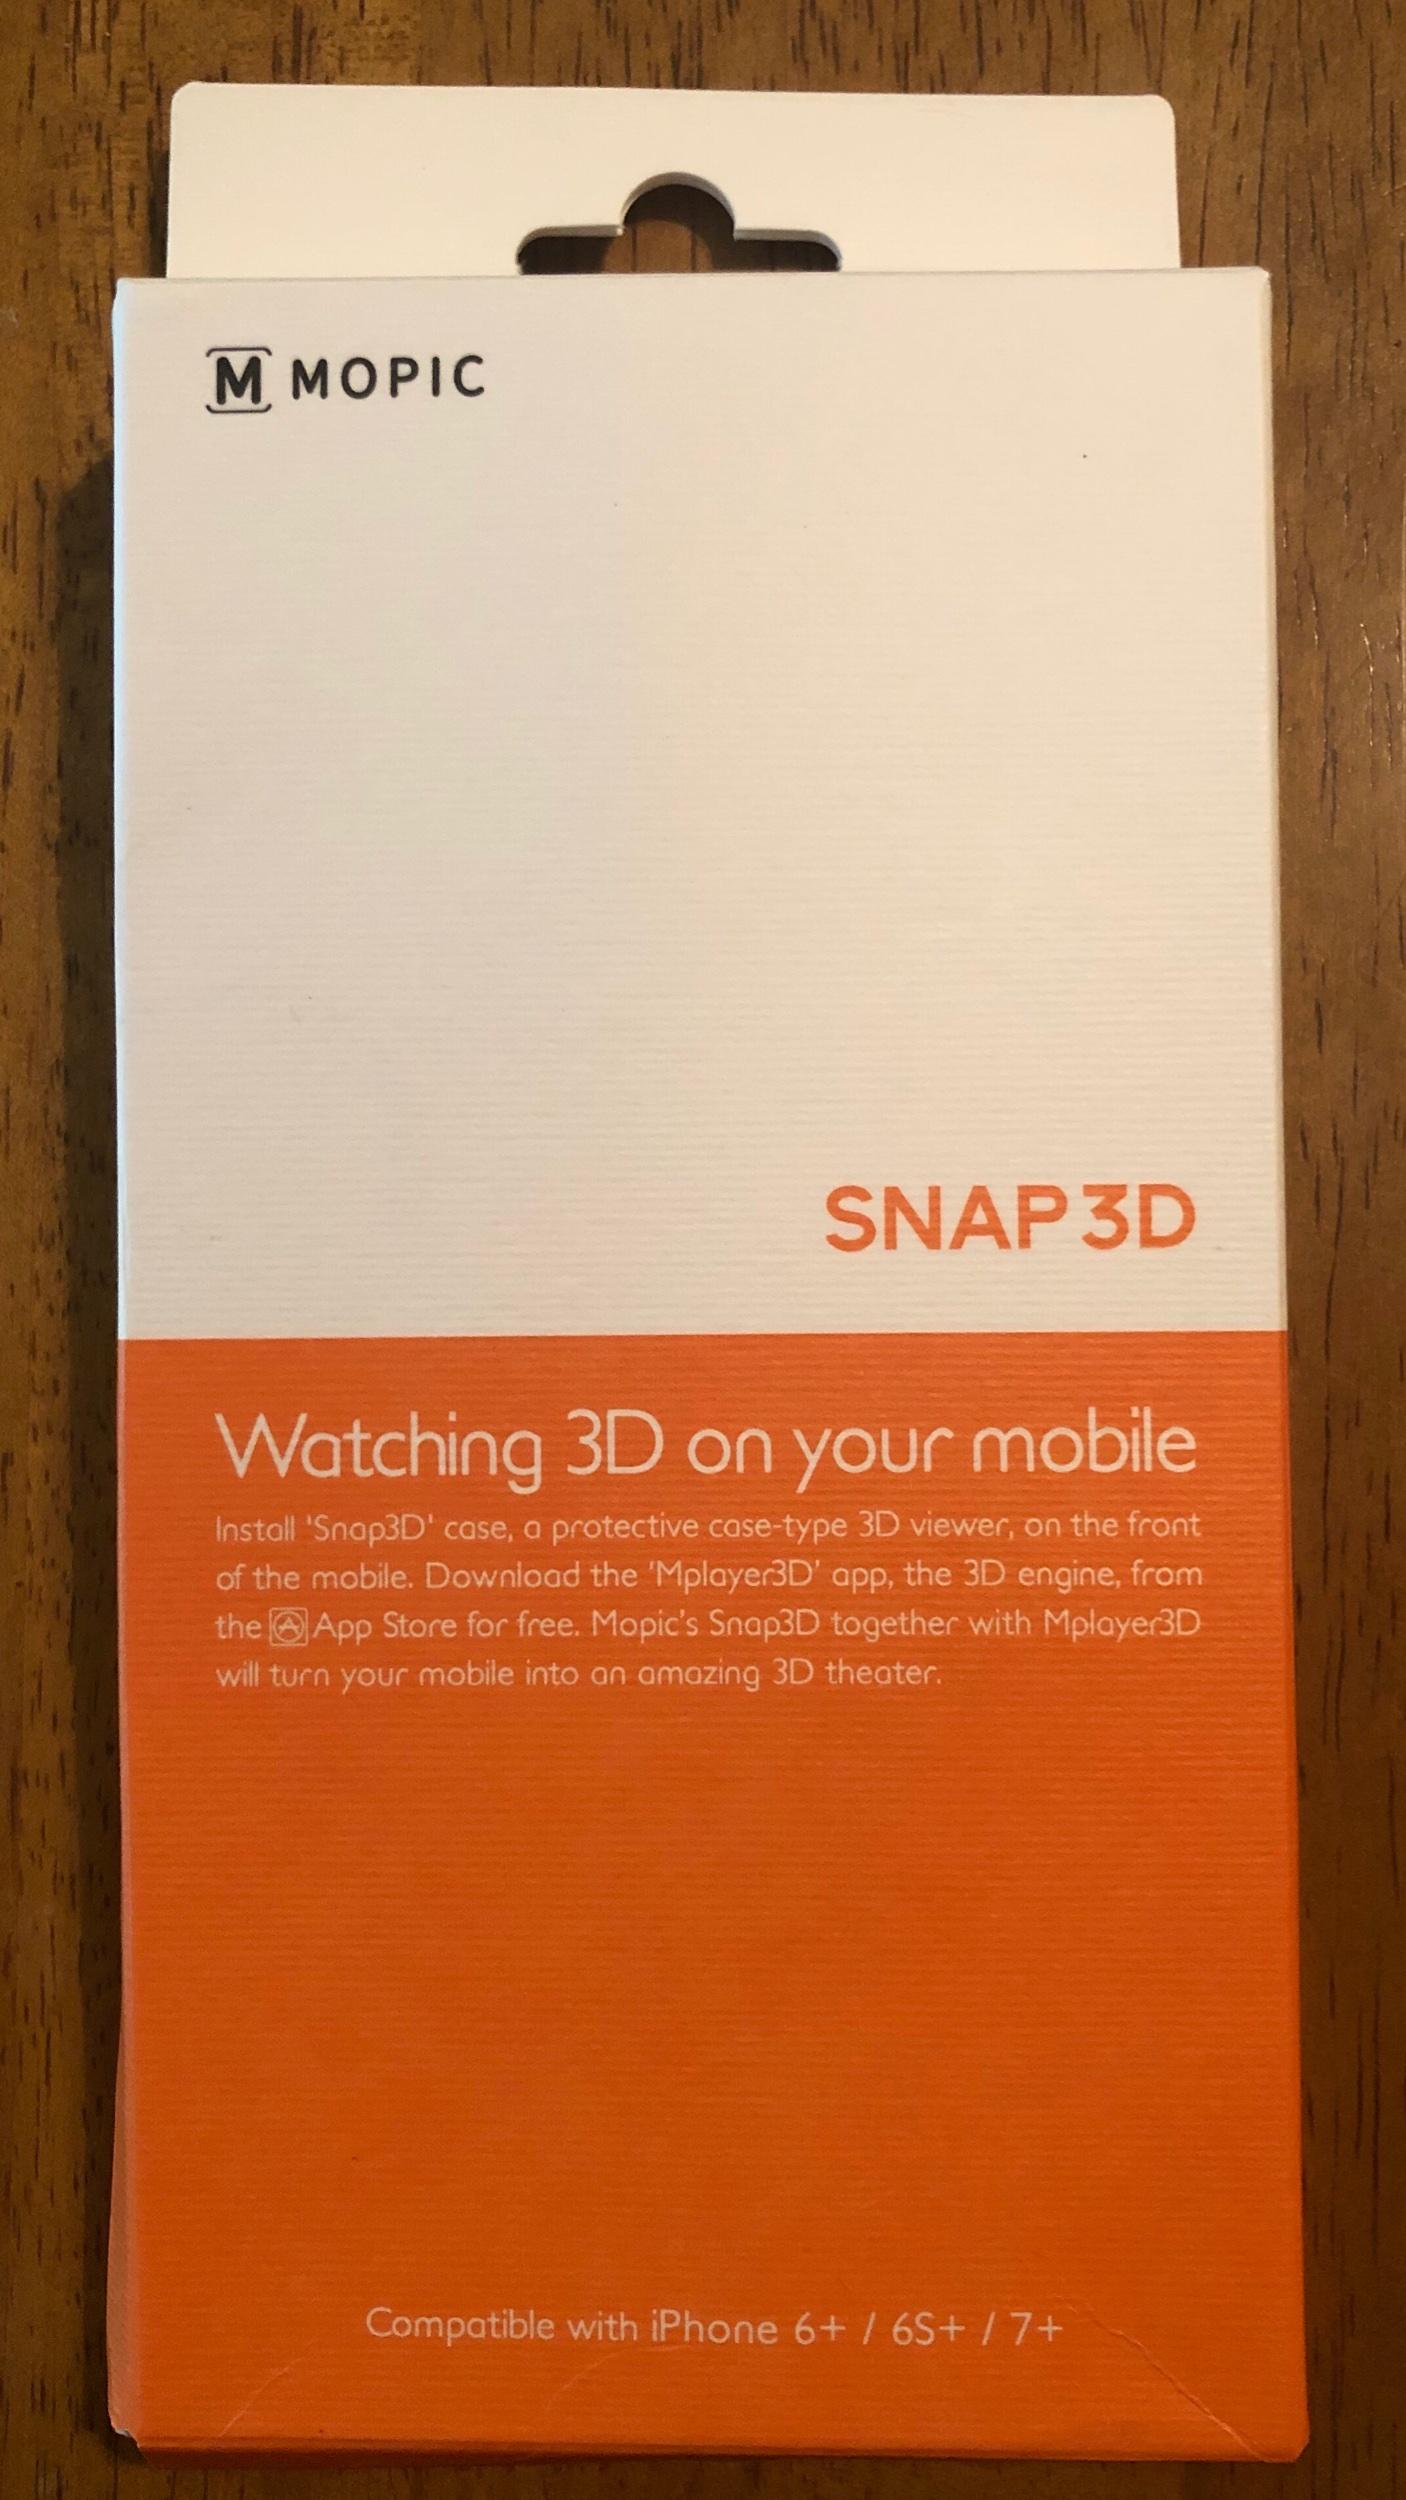 Mopic-3d-snap-3-d-.jpeg